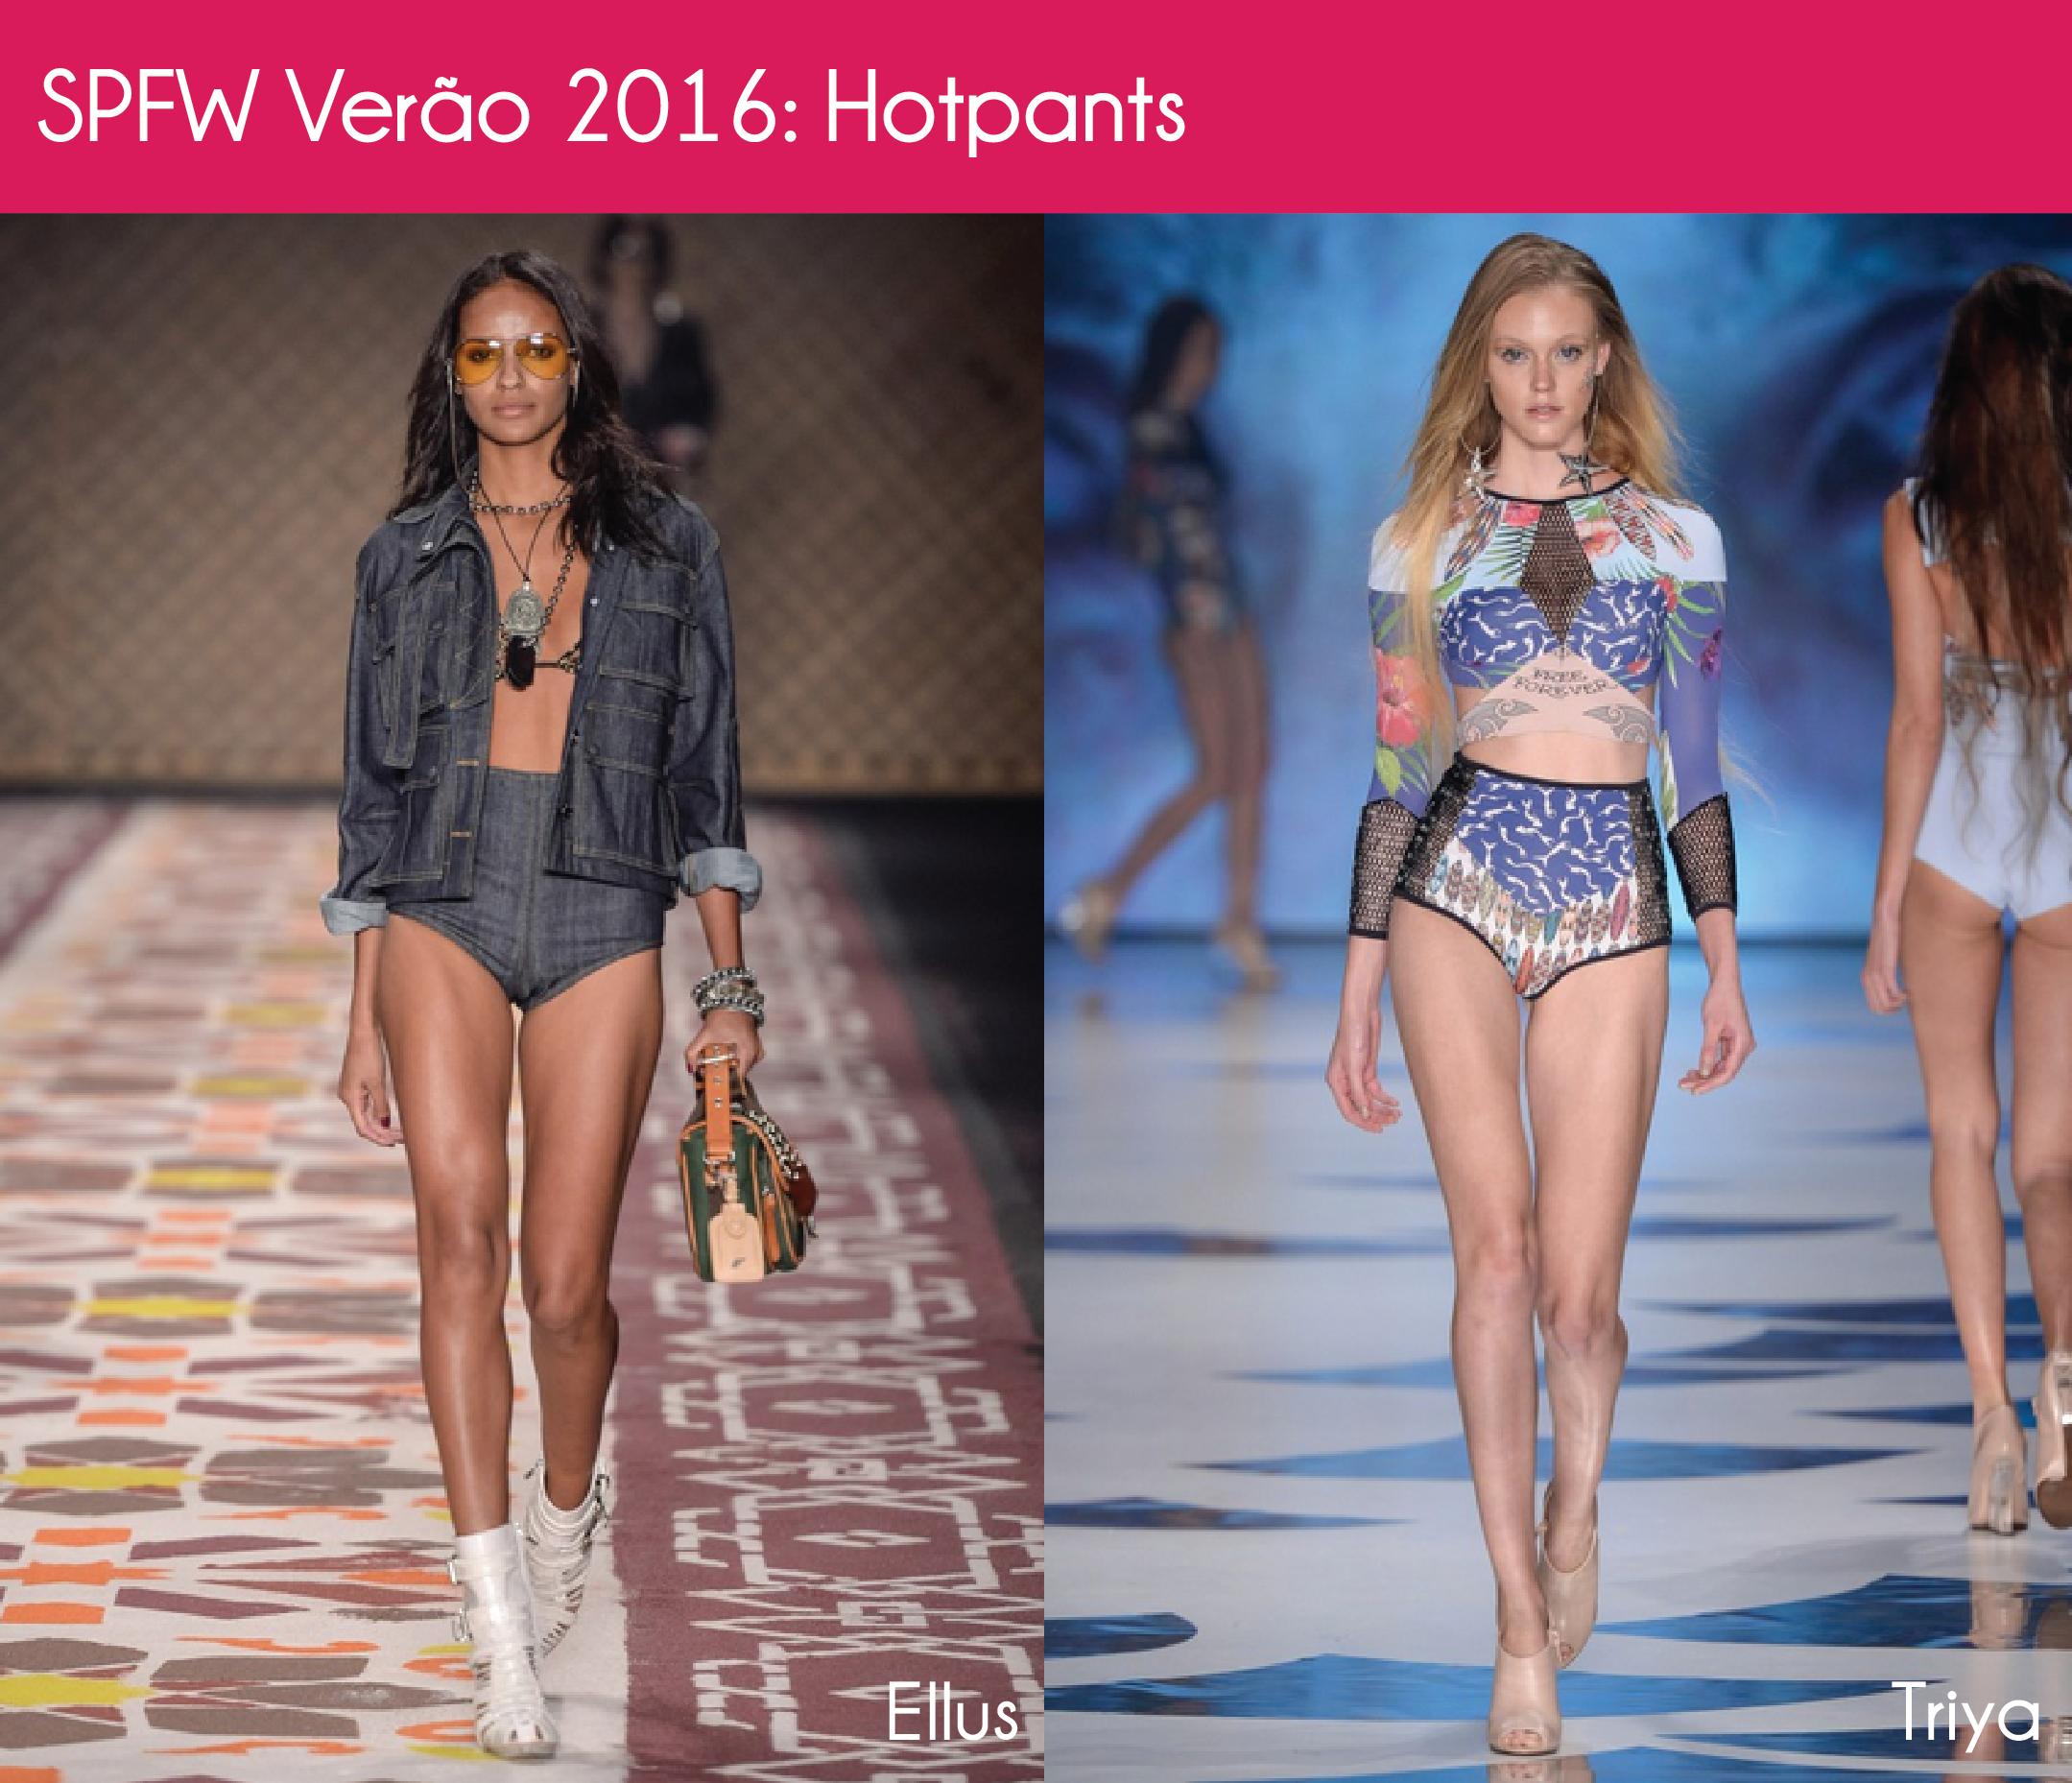 Bolsa De Festa Tendencia 2015 : Spfw tendencia verao moda brecho ellus juliana